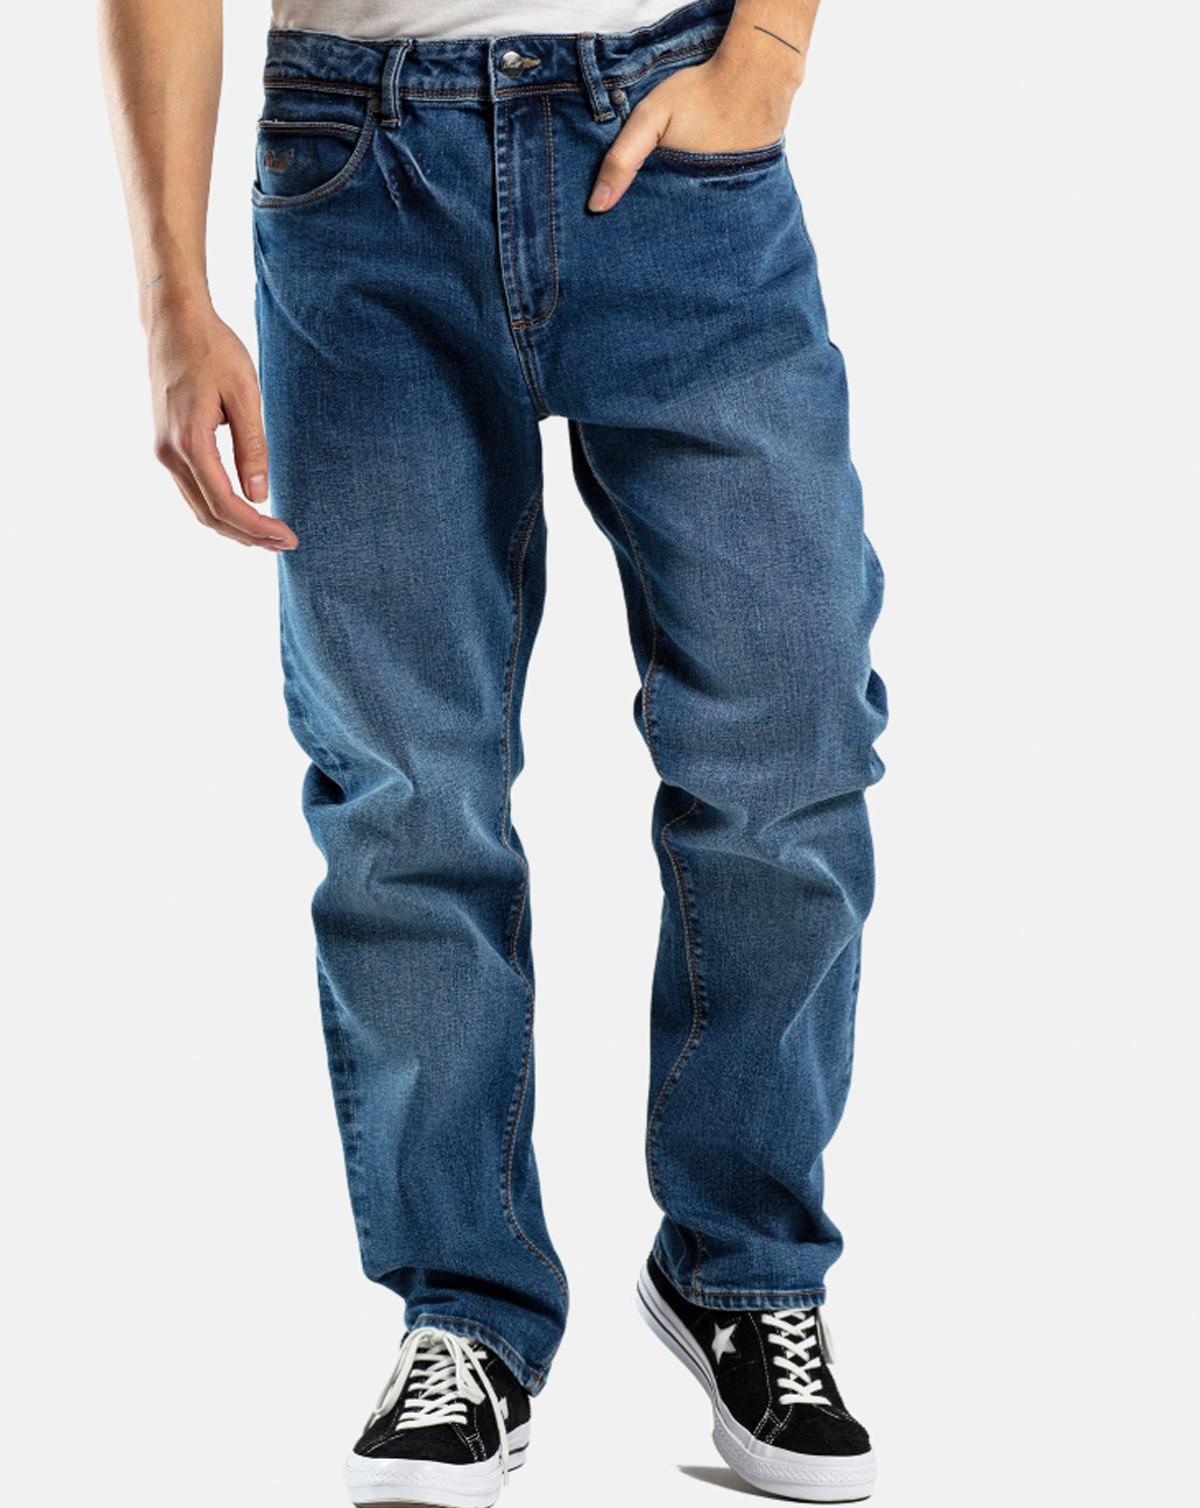 Image of   Reell Drifter Jeans (Blå Midnat, W32 / L32)